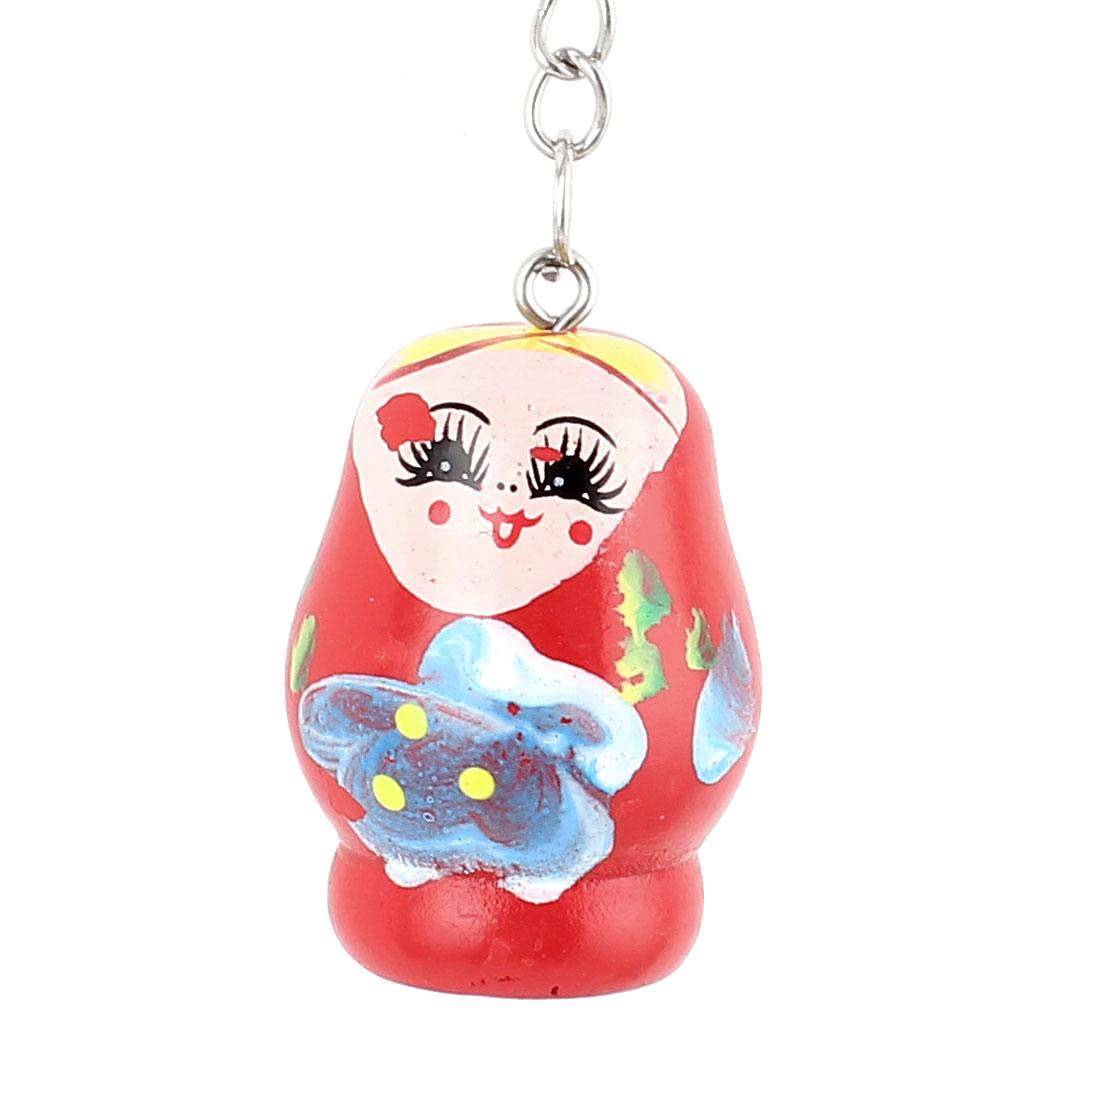 Wooden Matryoshka Style Painted Nesting Doll Key Holder Keychain Keyring Red